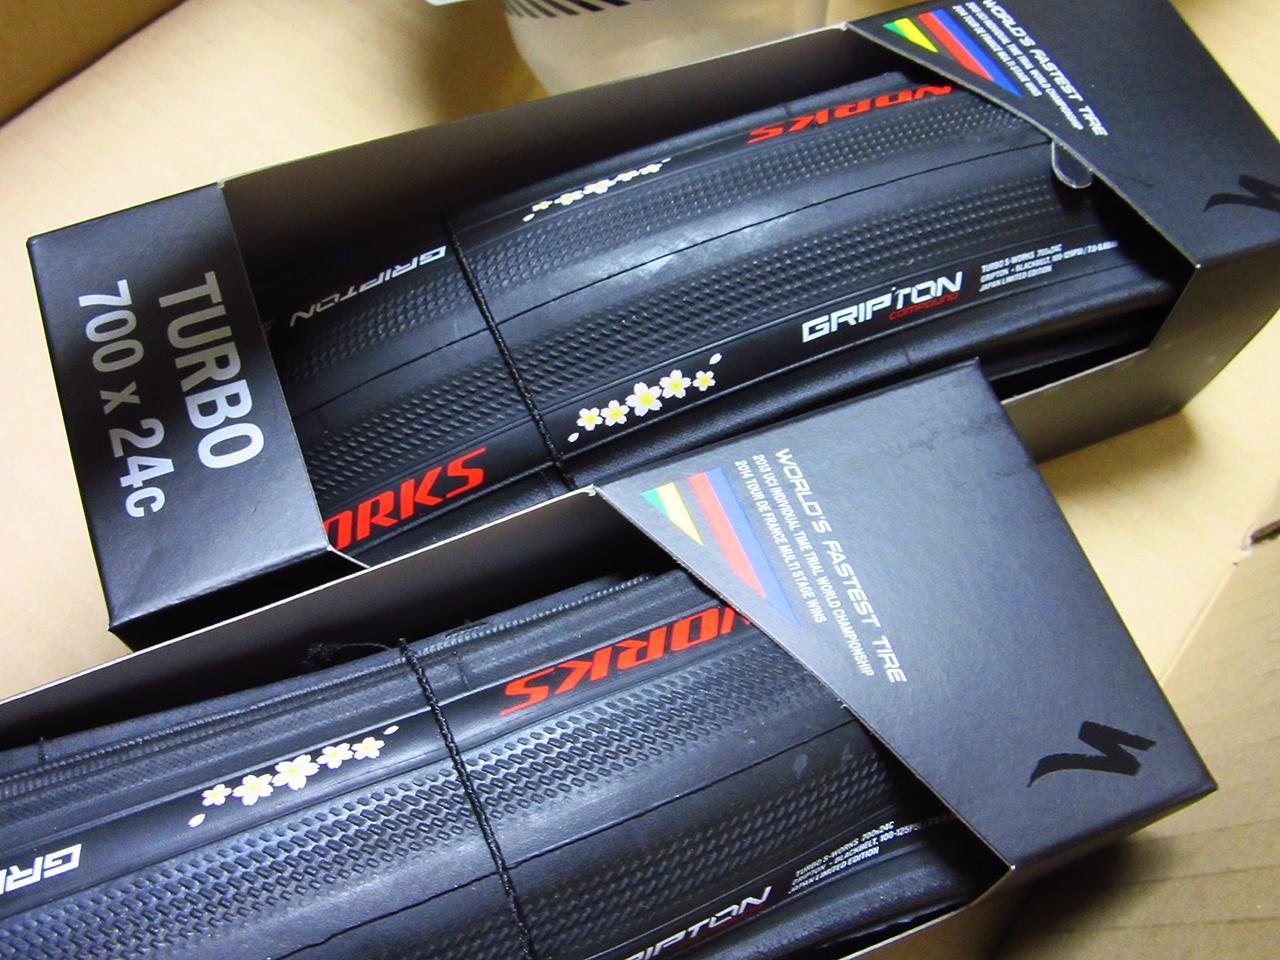 http://moritetsu.info/bicycle/img/IMG_2588sssss.jpg